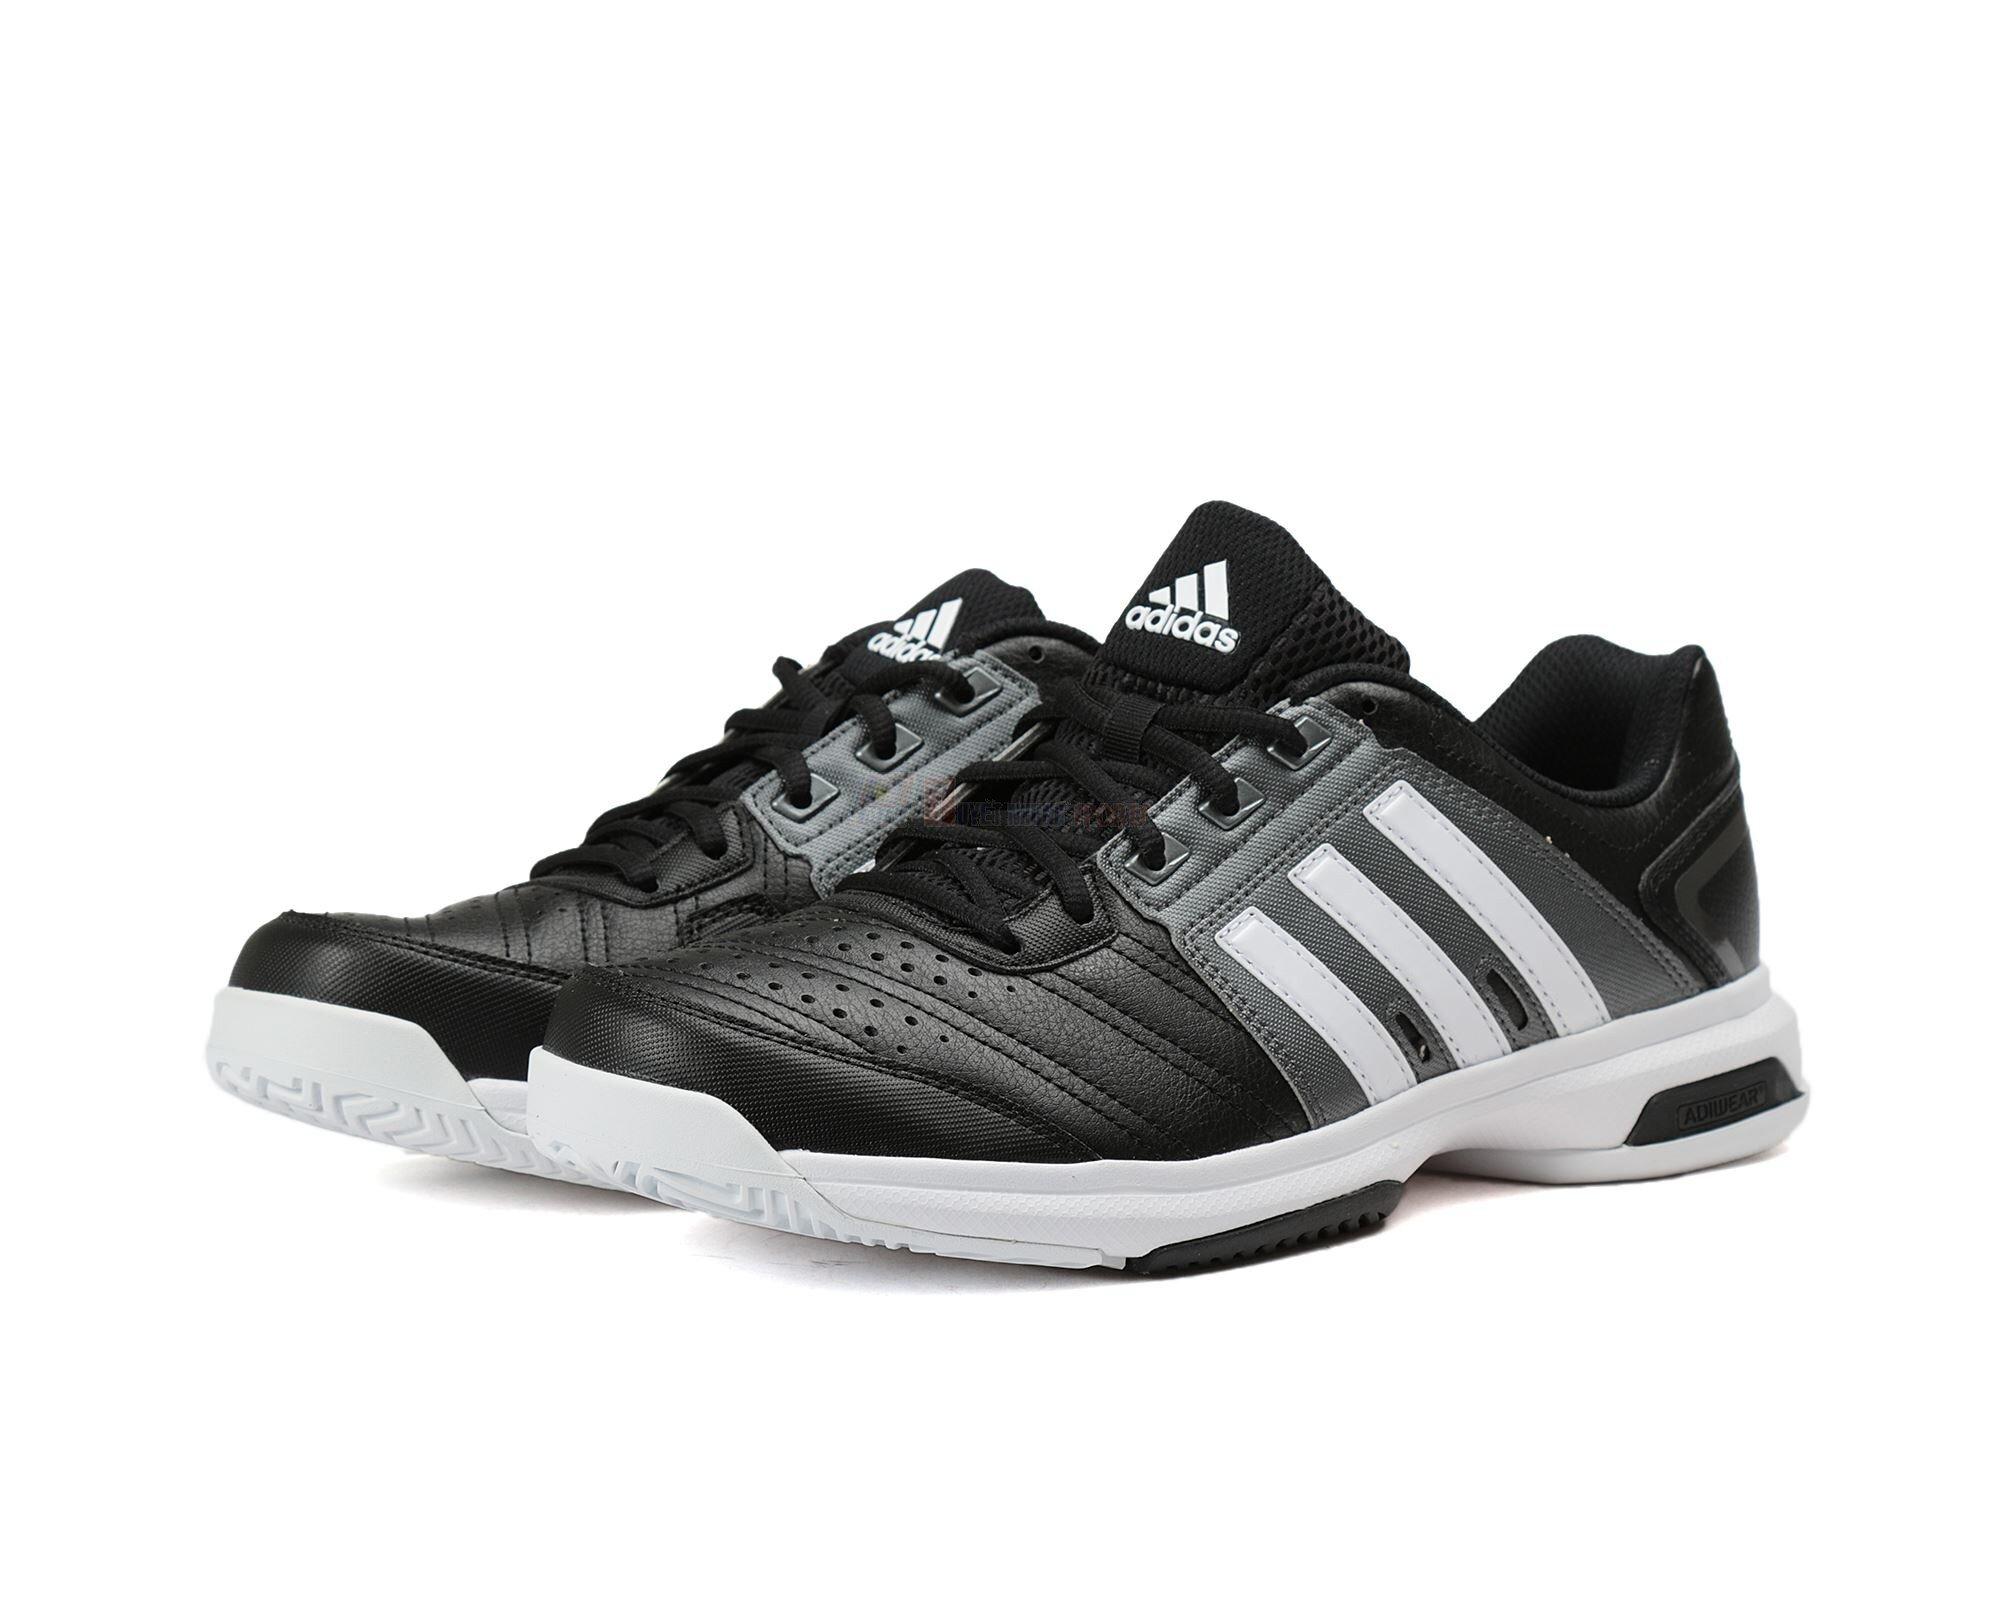 Giày Tennis Adidas Barricade Approach AQ2281